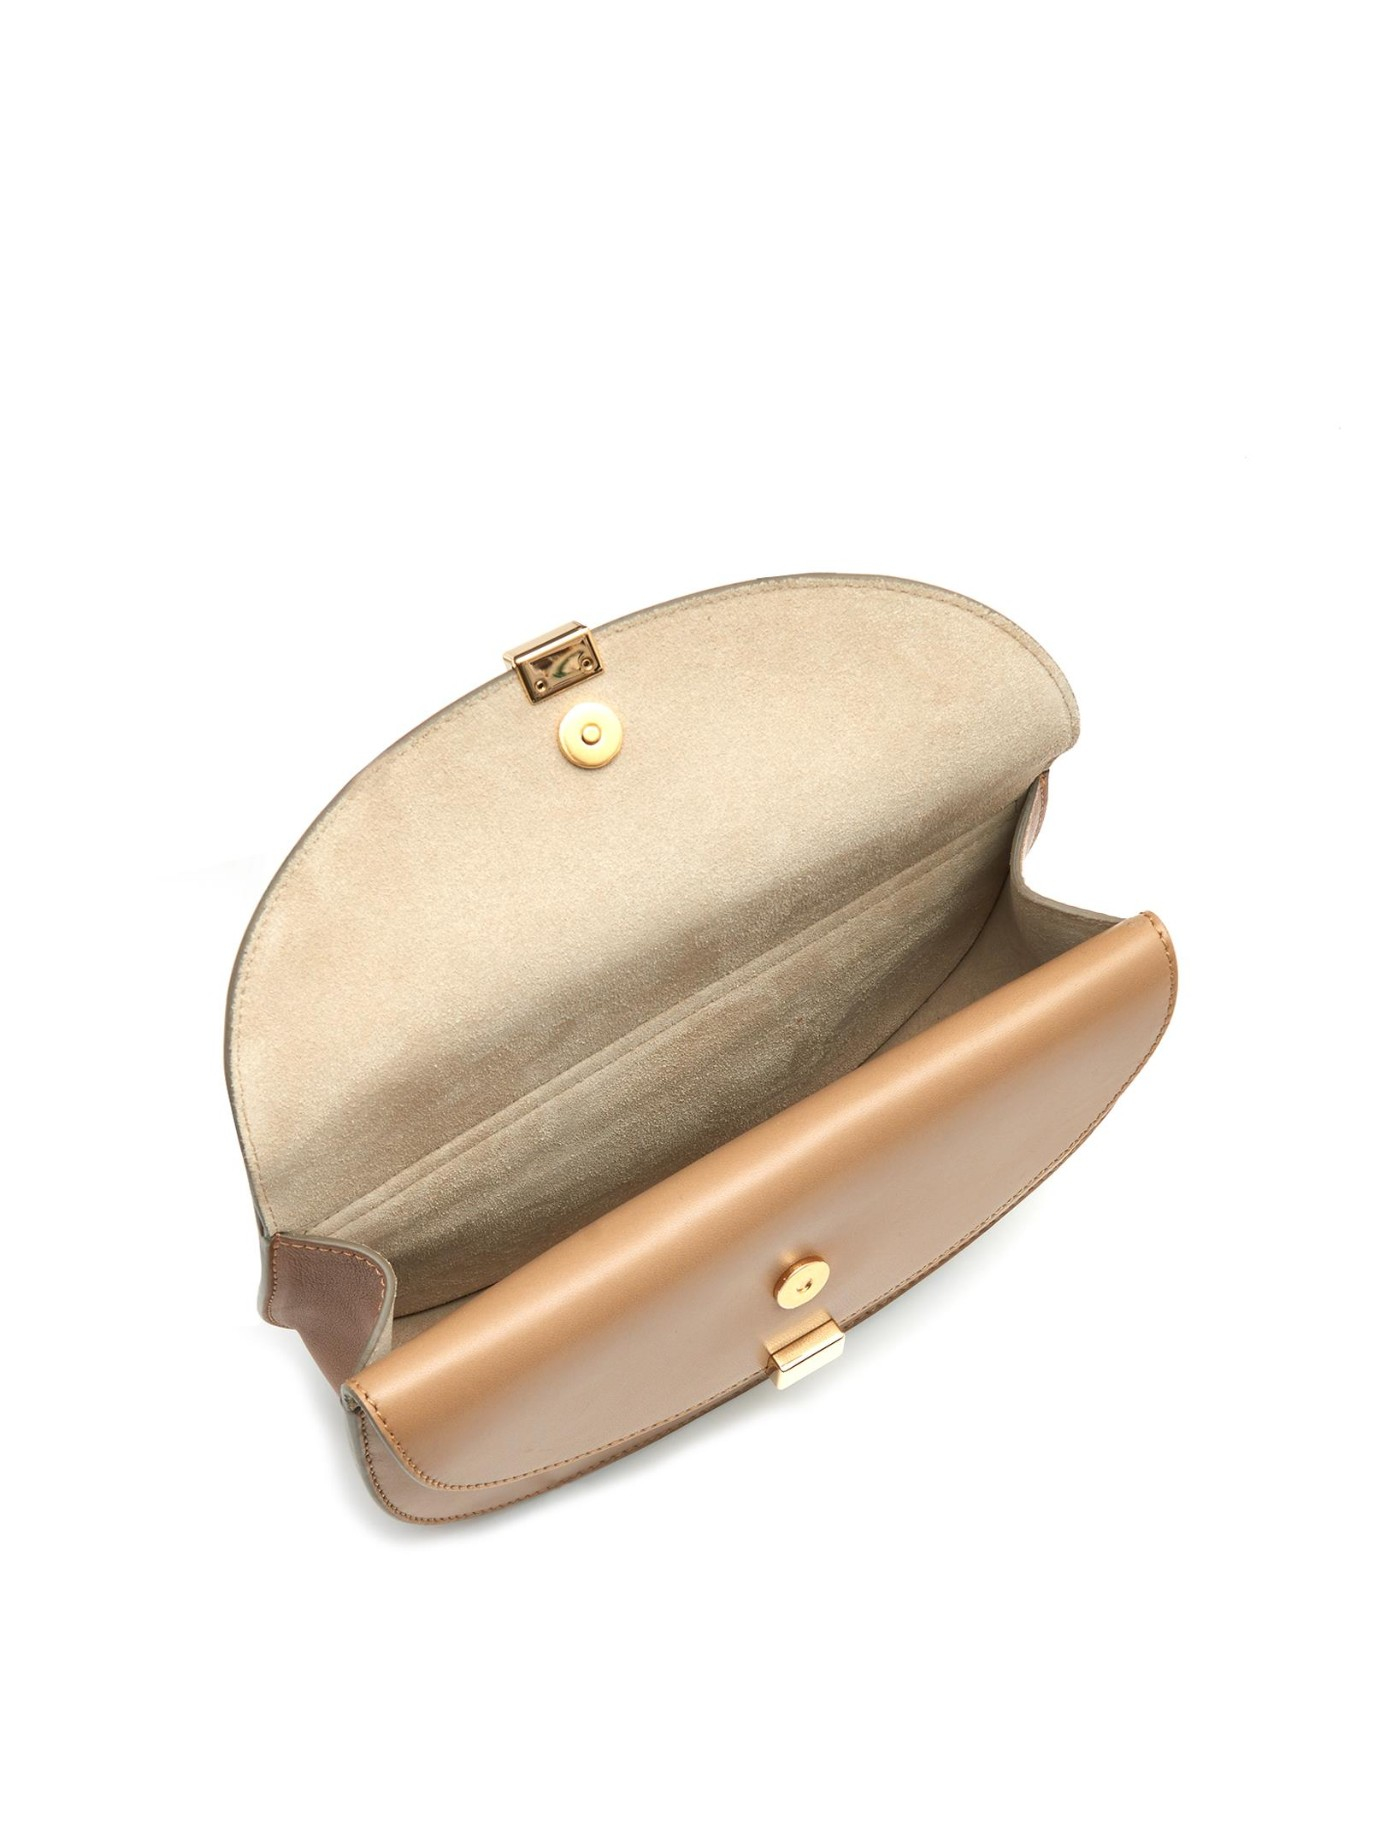 Chlo¨¦ Georgia Mini Leather Cross-Body Bag in Brown (DARK BEIGE) | Lyst